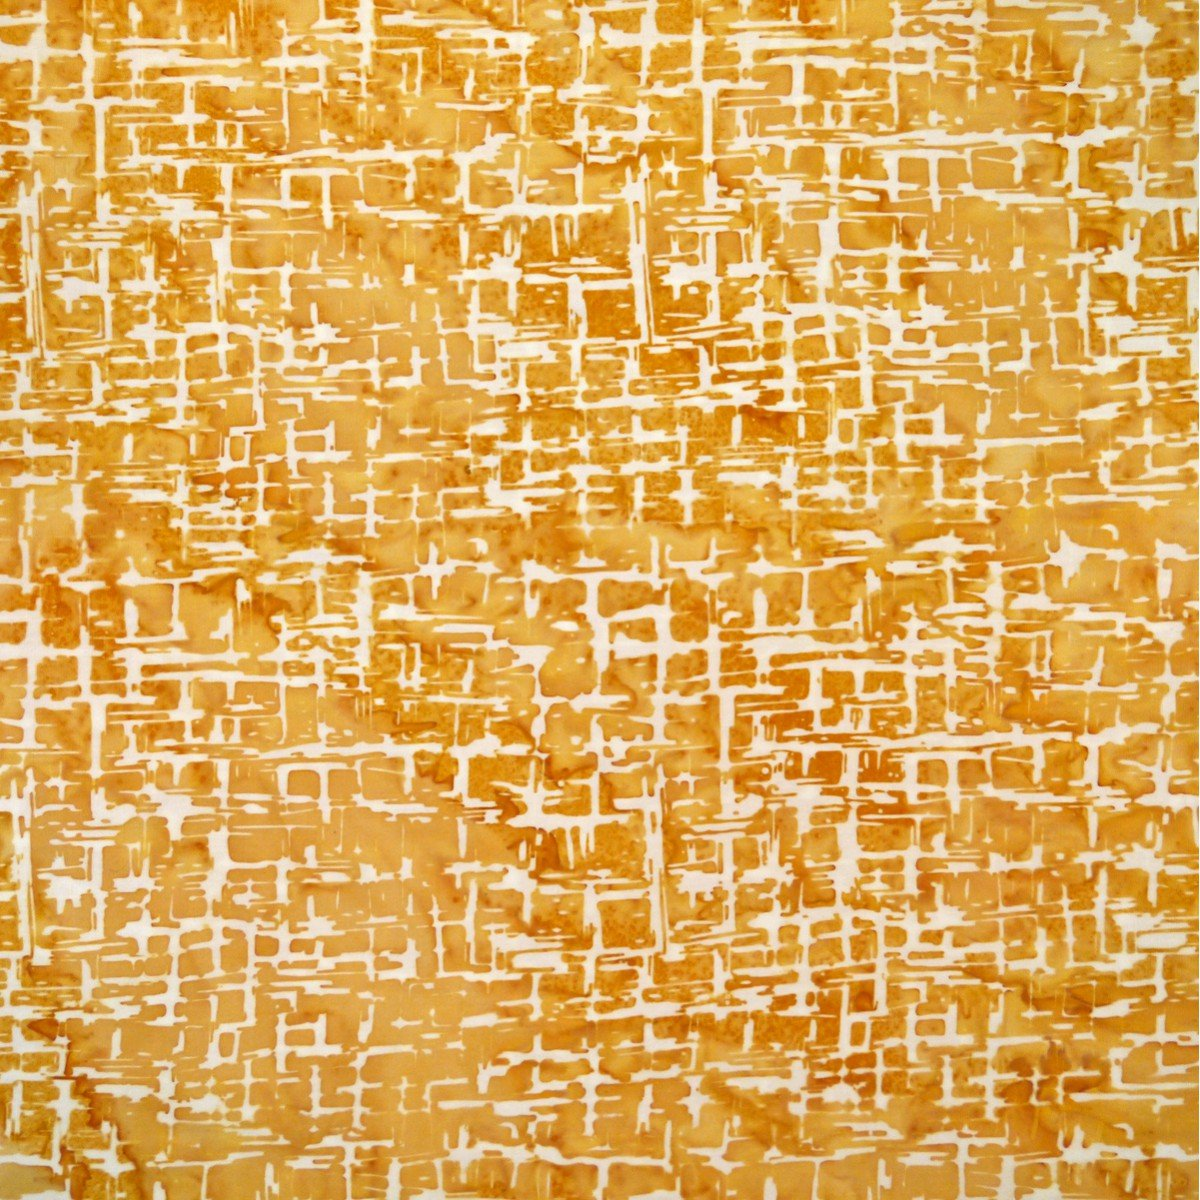 Batik by Mirah Sierra SR-6-9594 Espiga Yellow